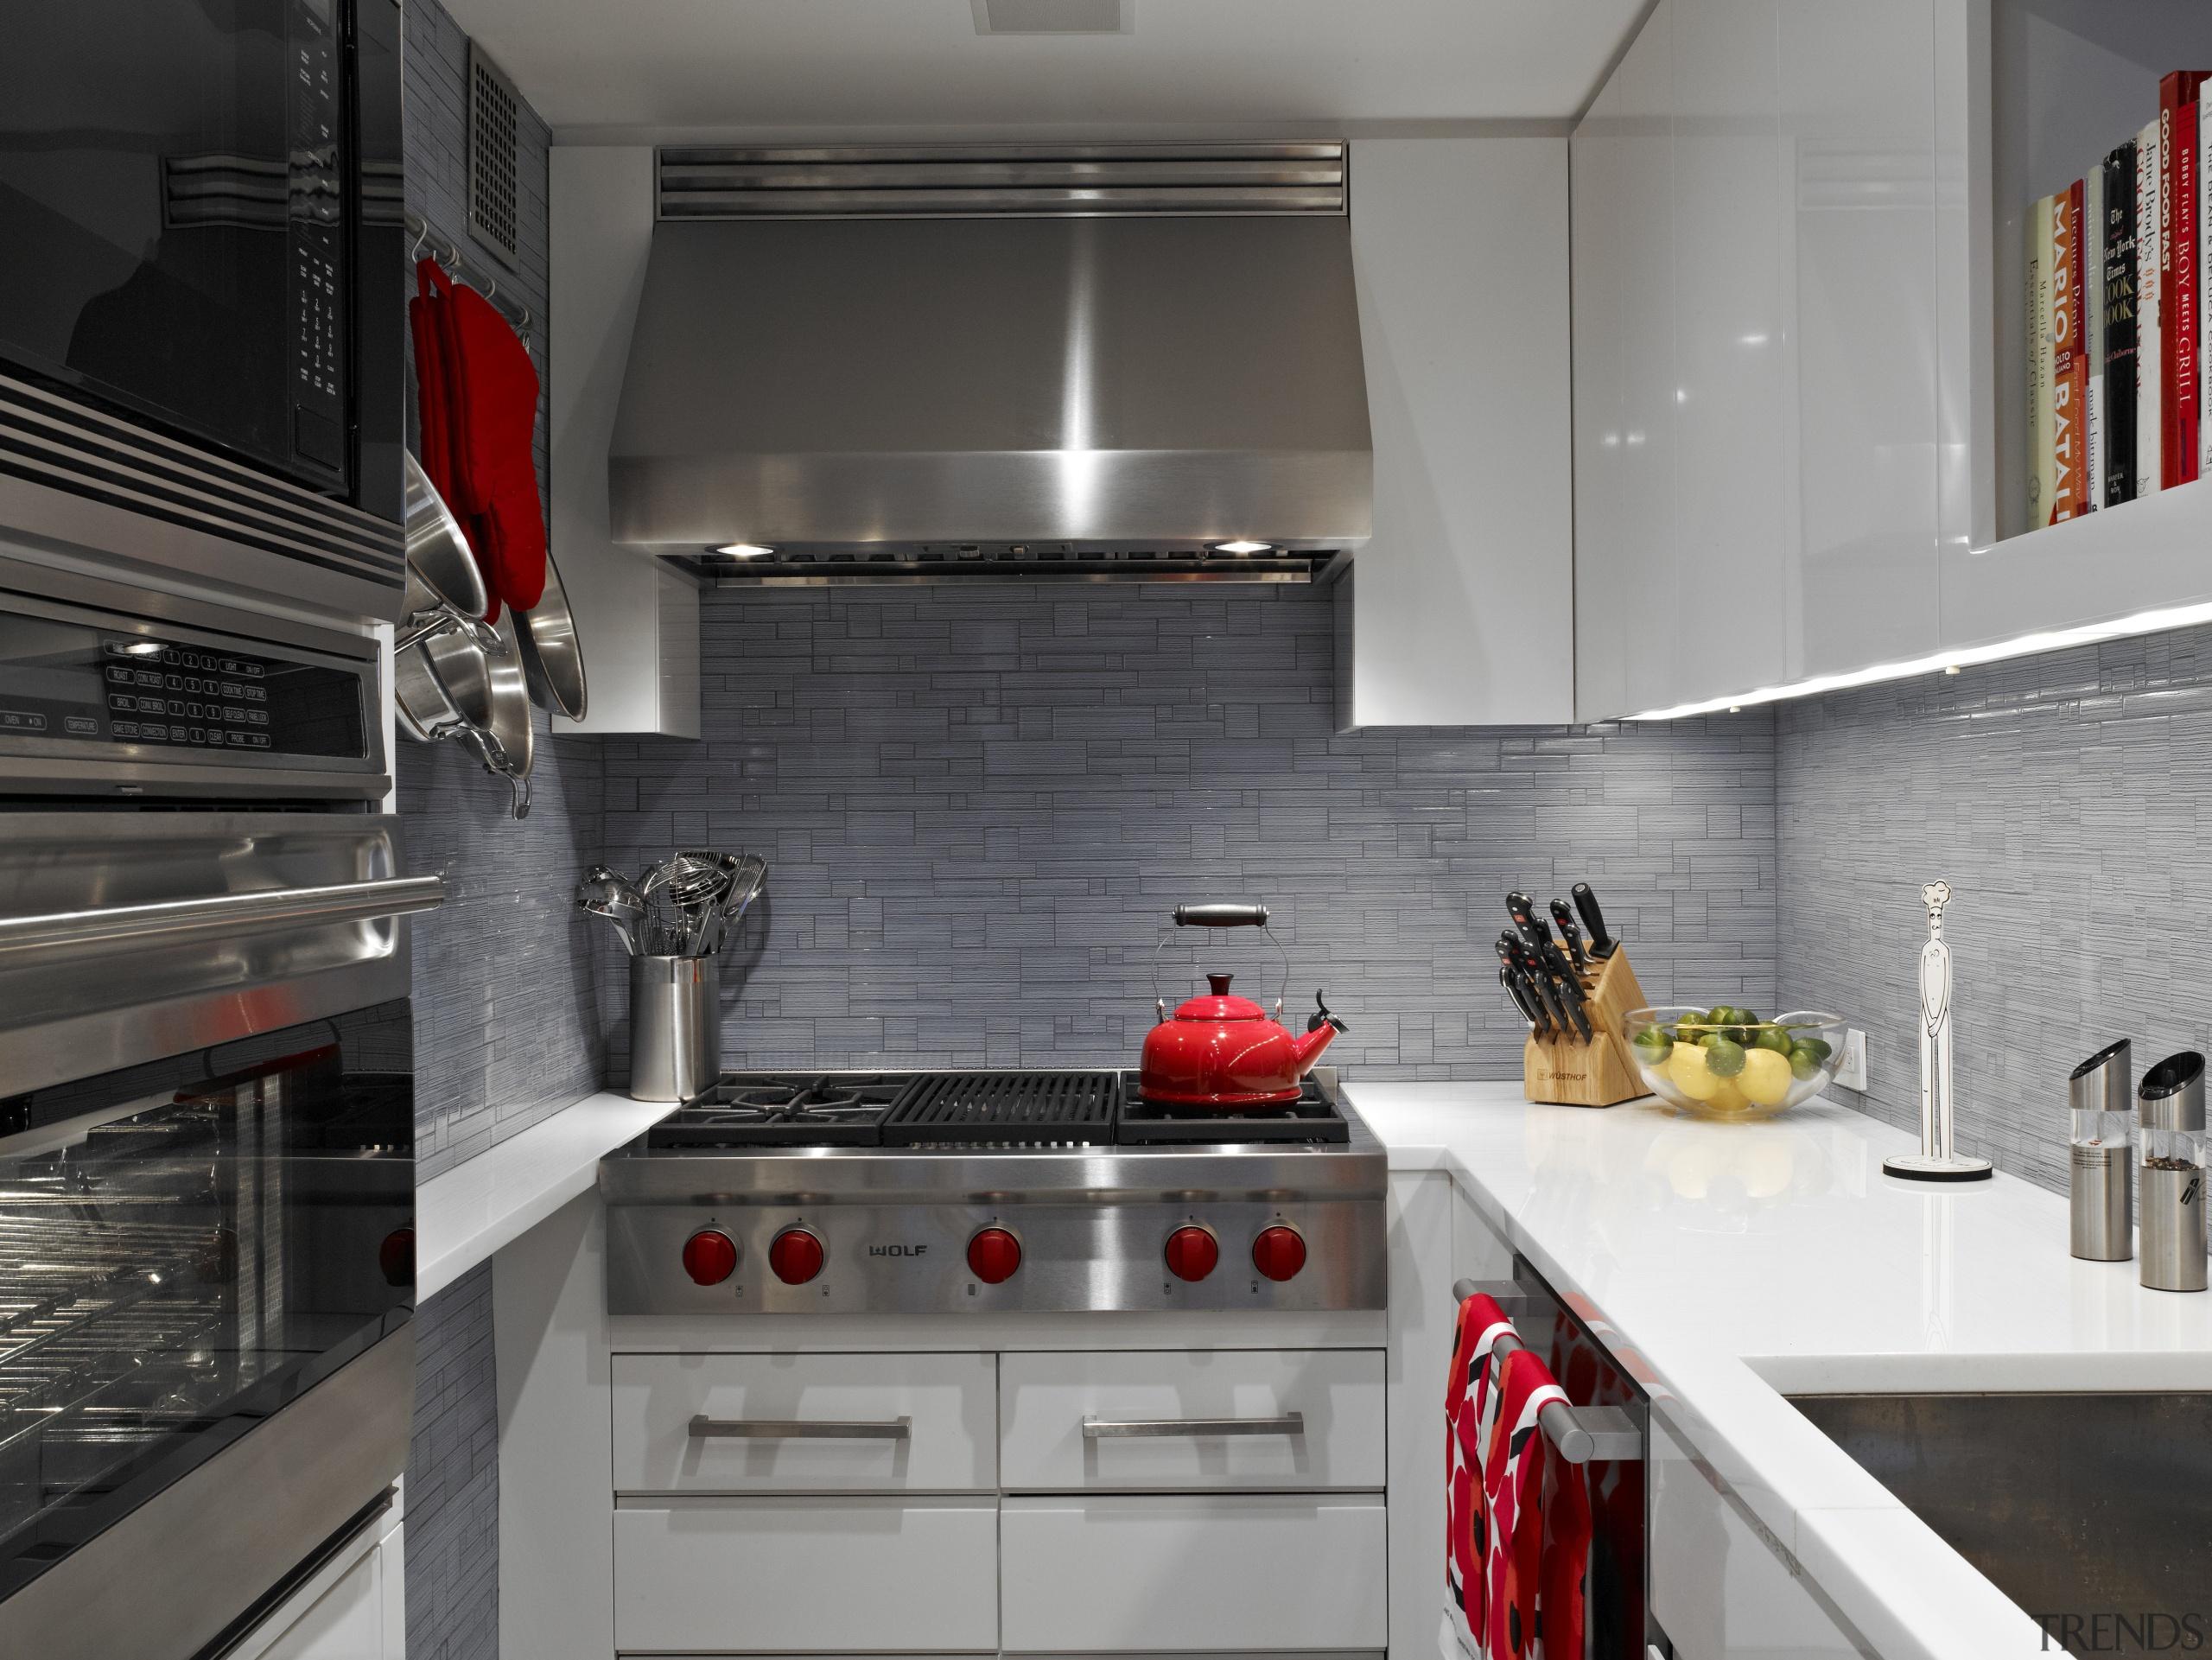 A narrow shelf next to the cooktop is countertop, interior design, kitchen, room, gray, black